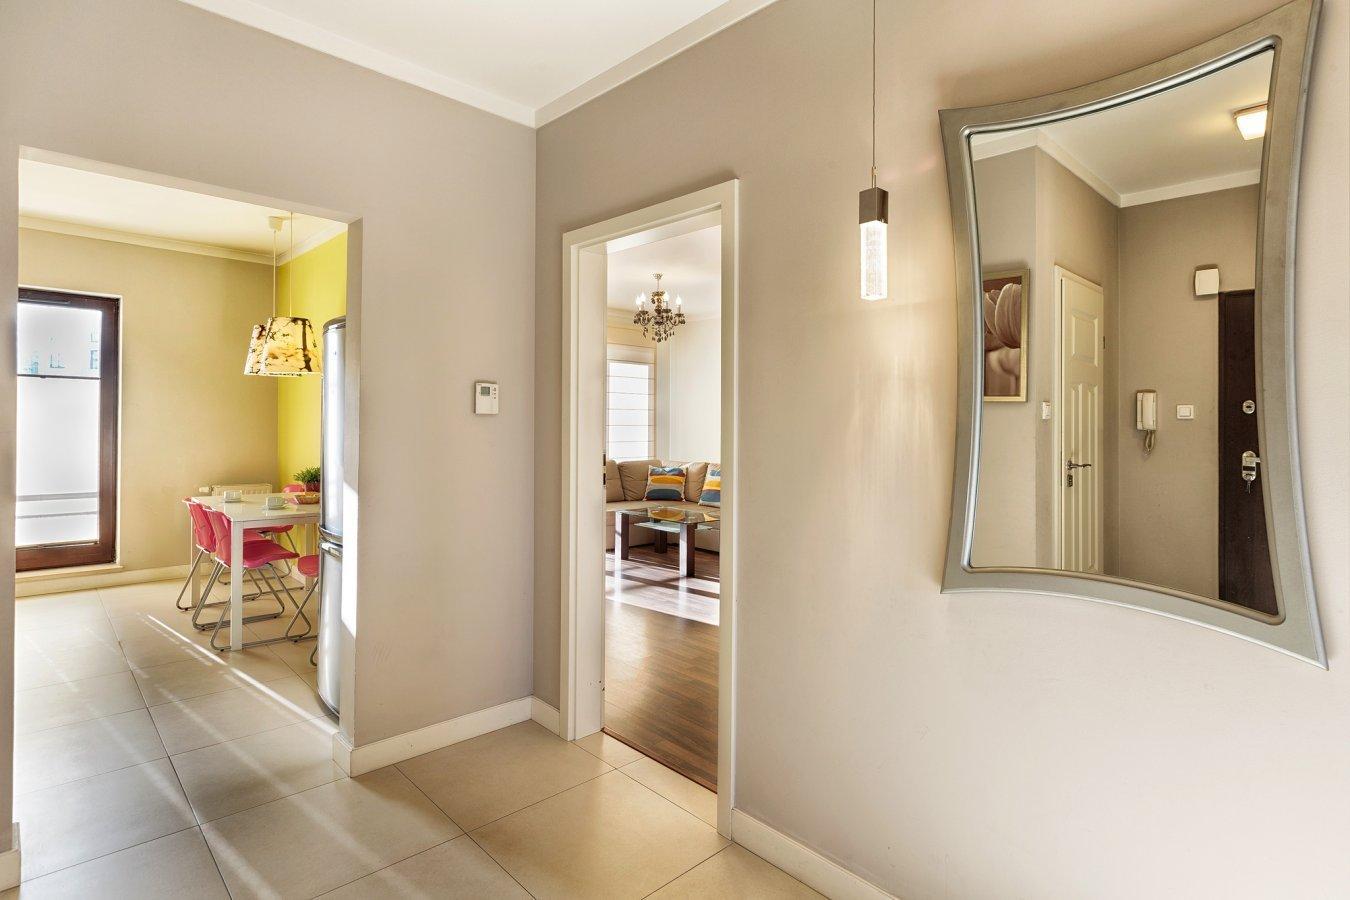 Hallway at Zeligowskiego Apartments